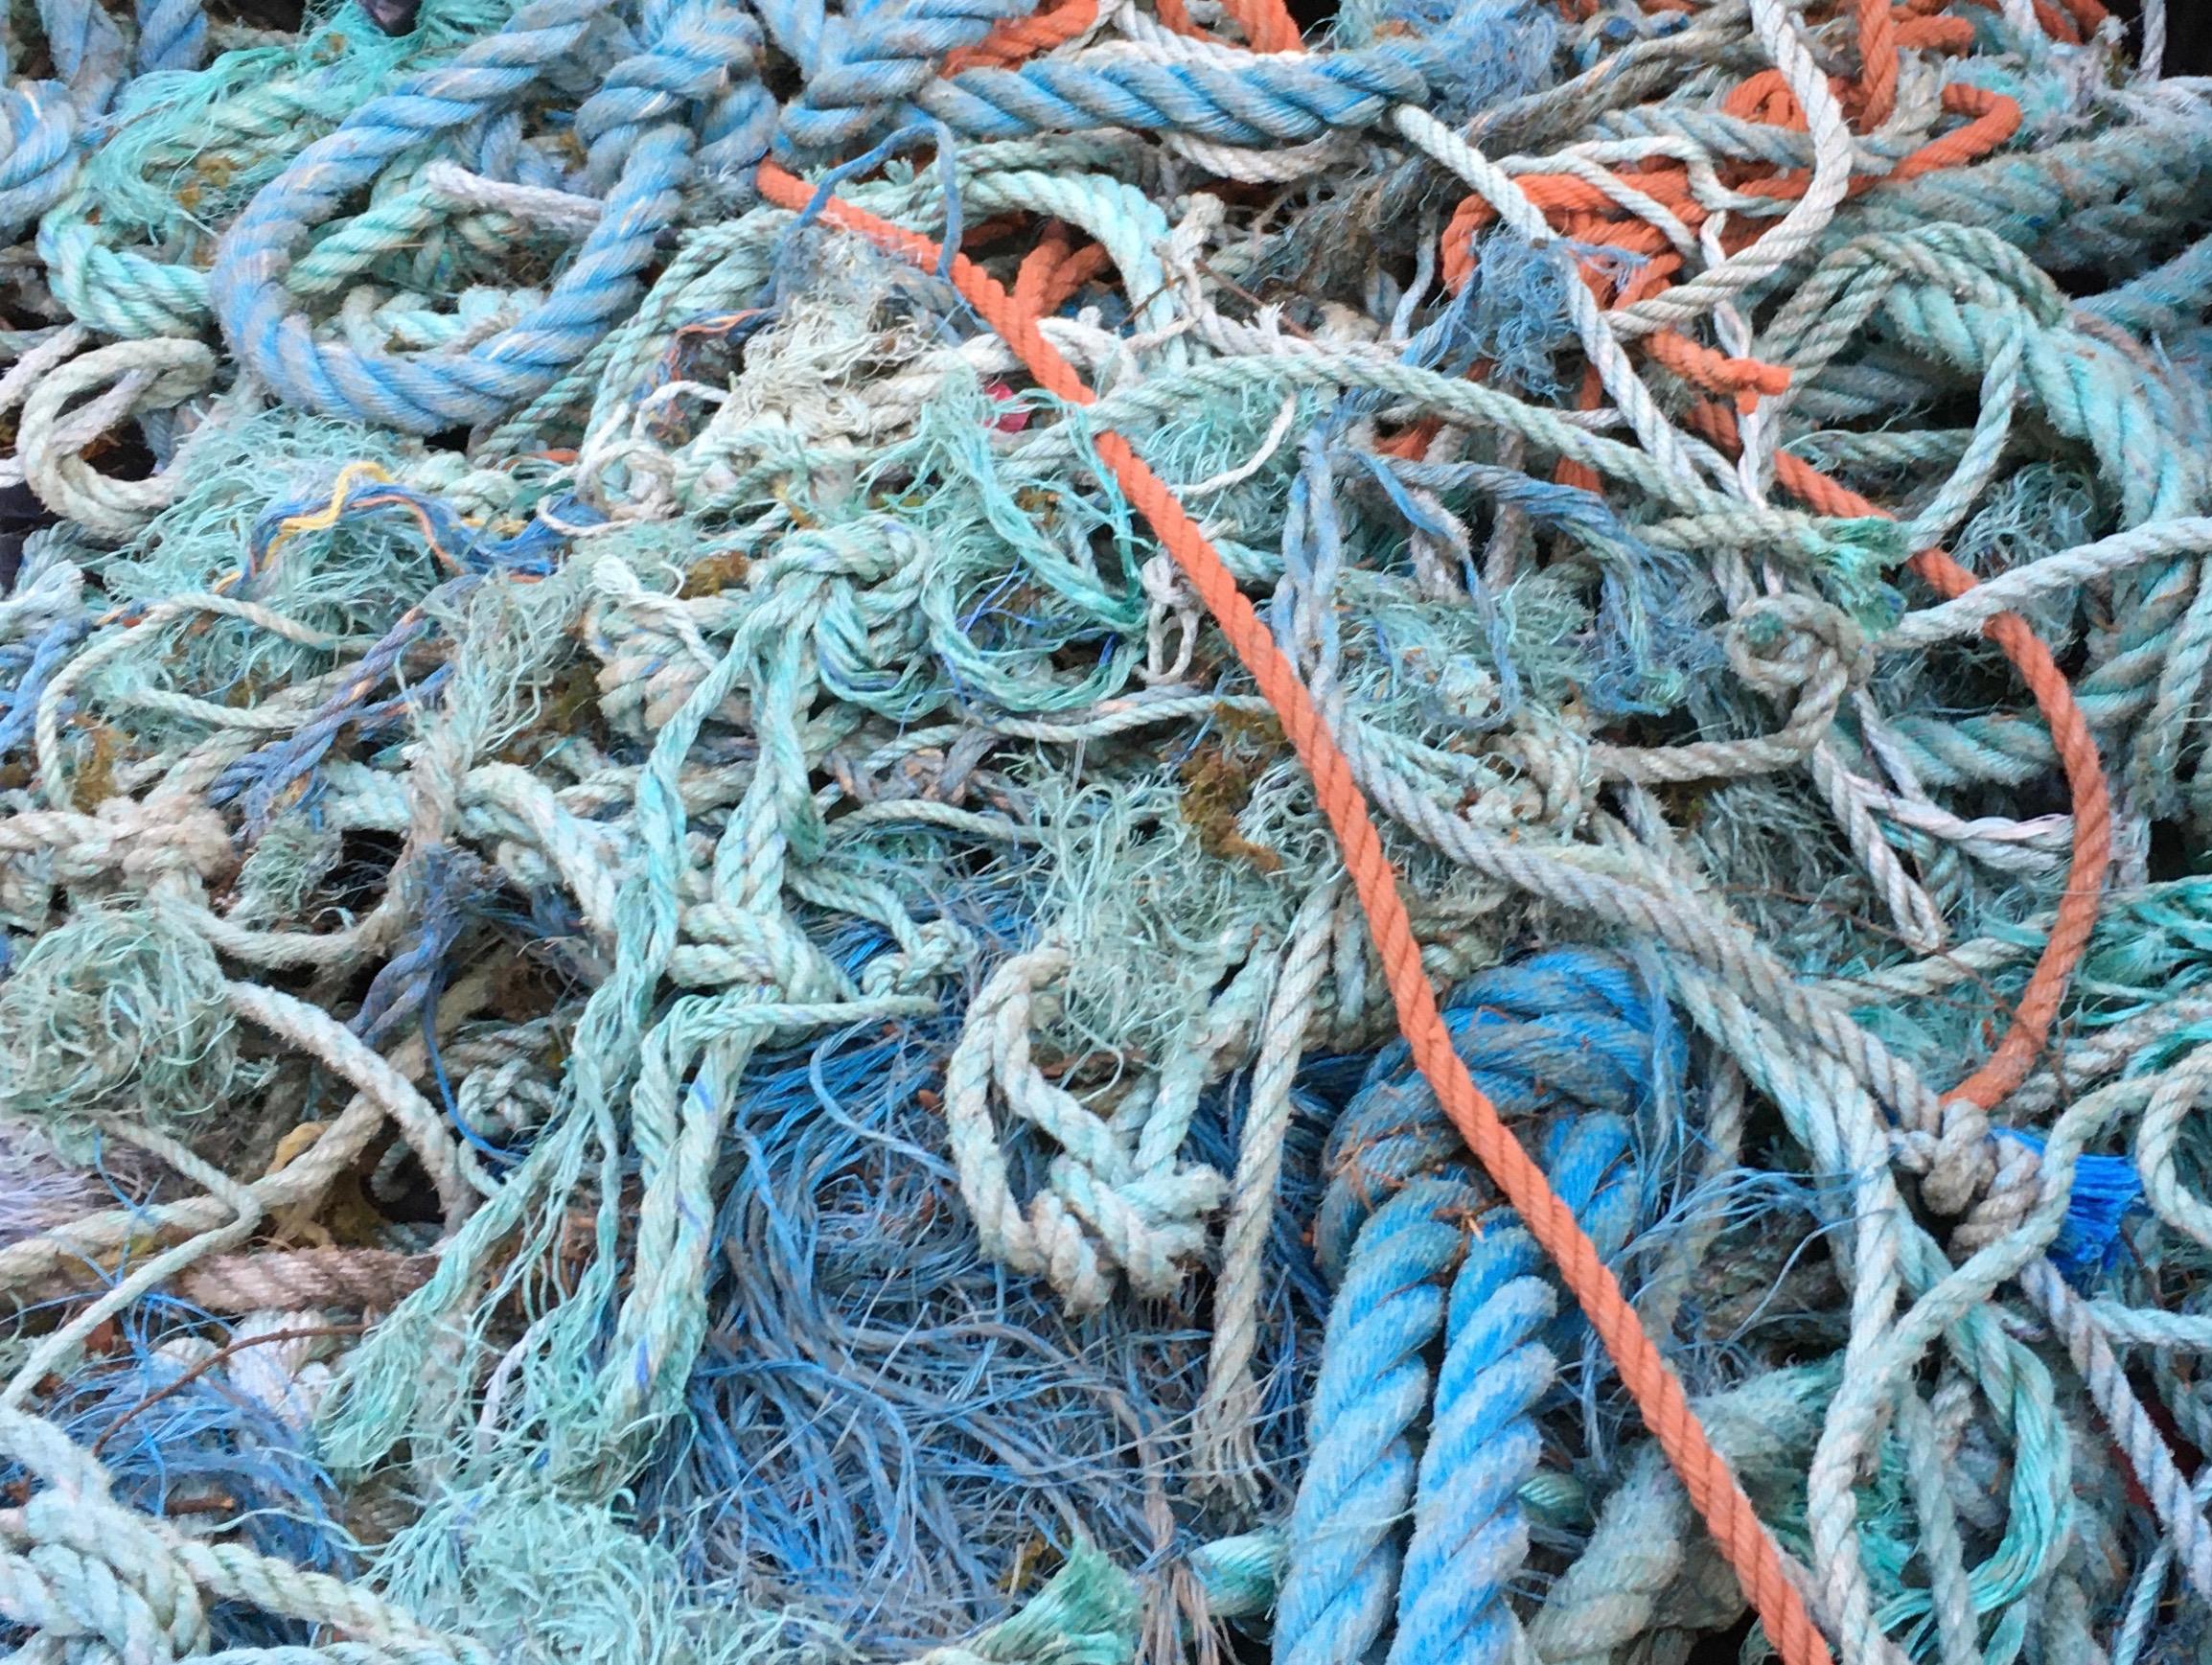 Beach rope found on Hornby Island beaches